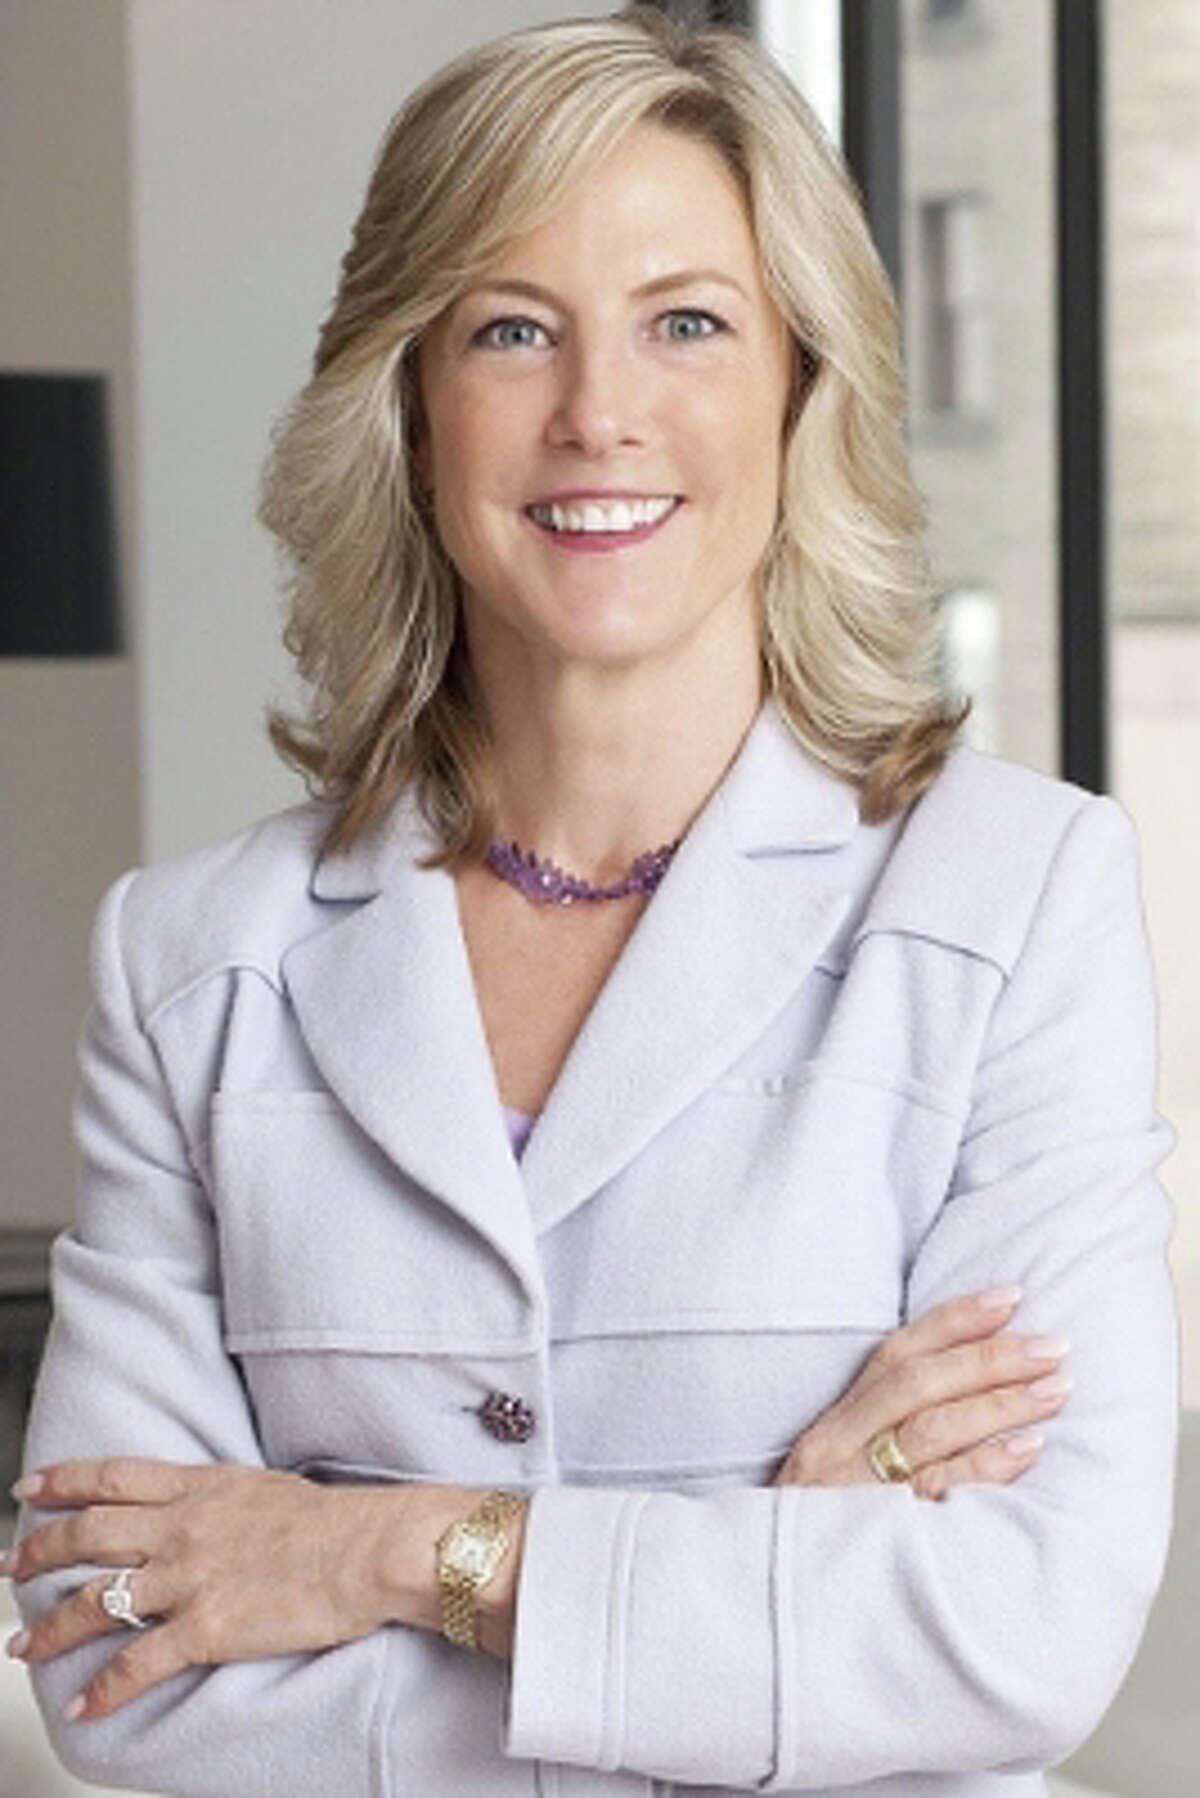 Michelle Russell Johnson